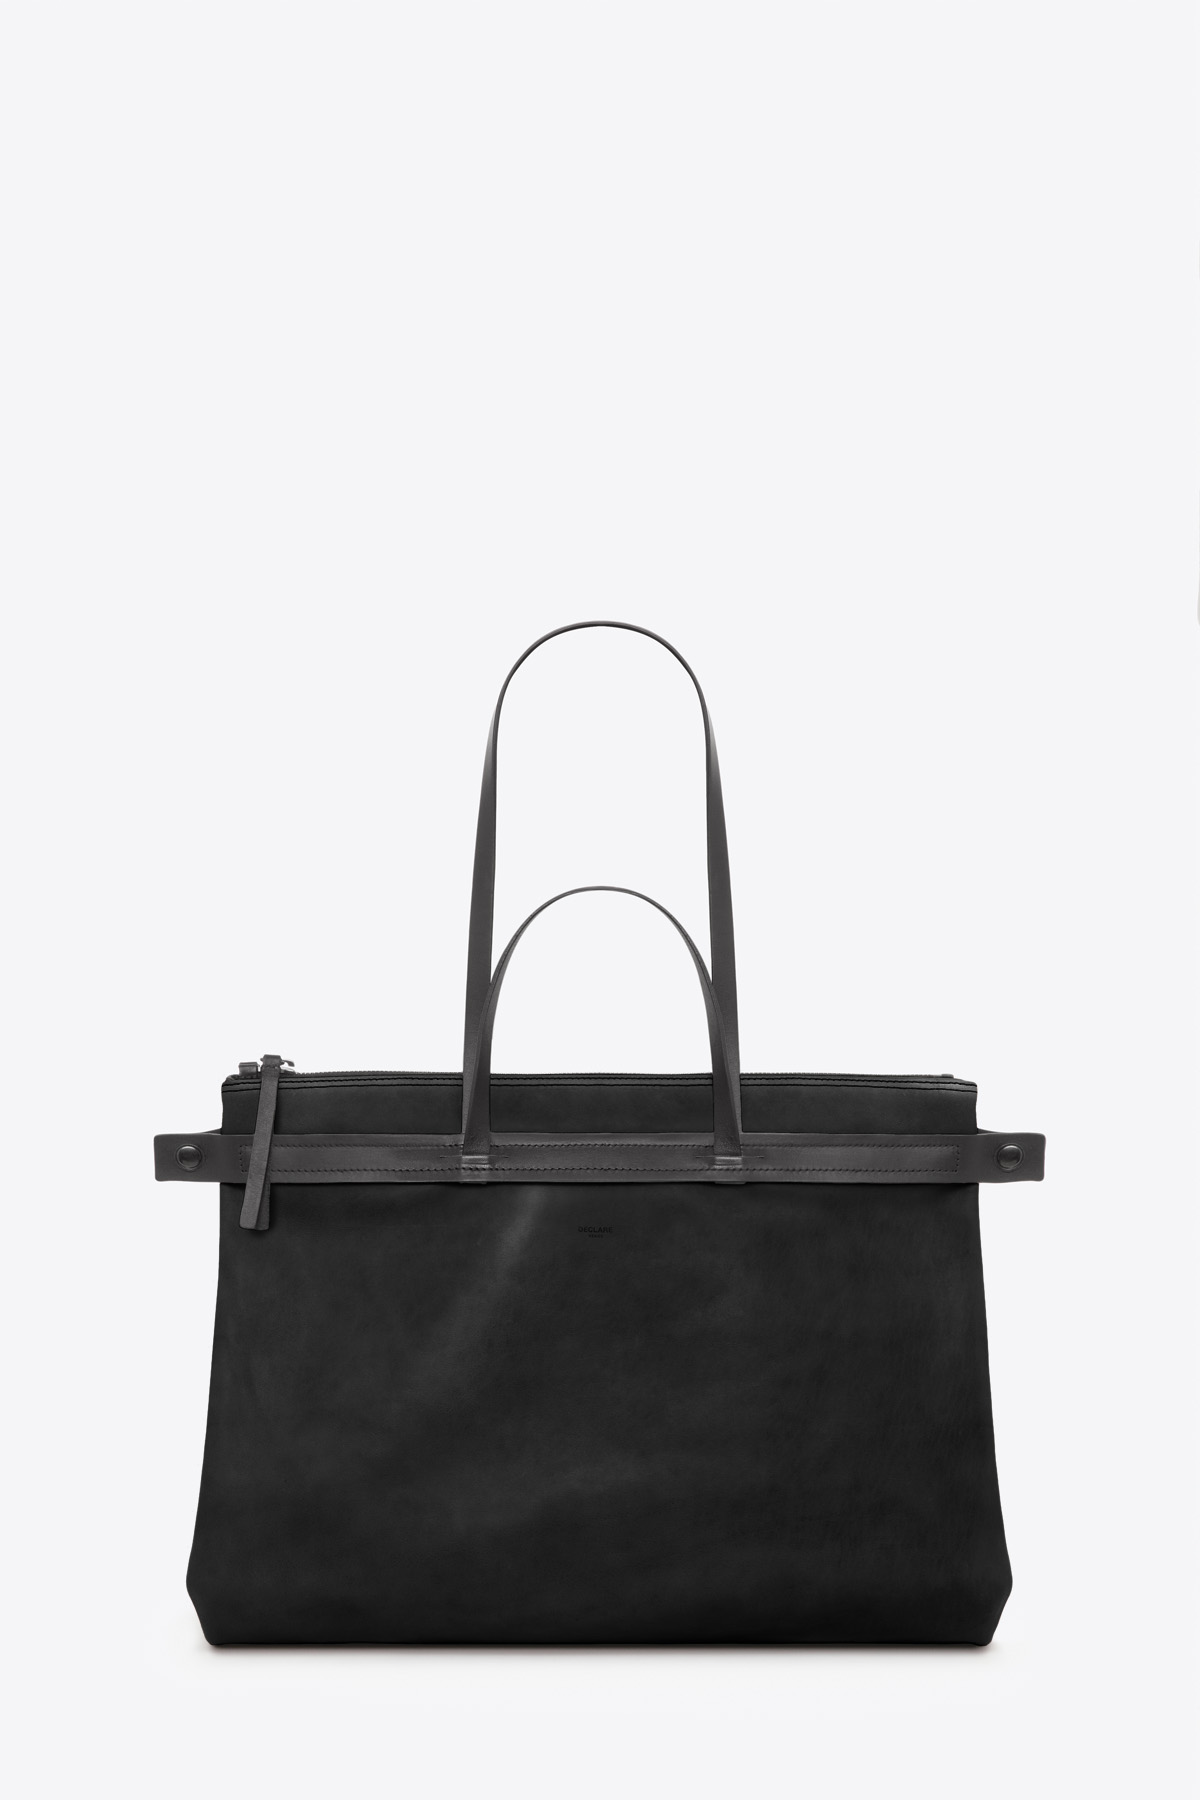 dclr007l-tote-a1-black-front